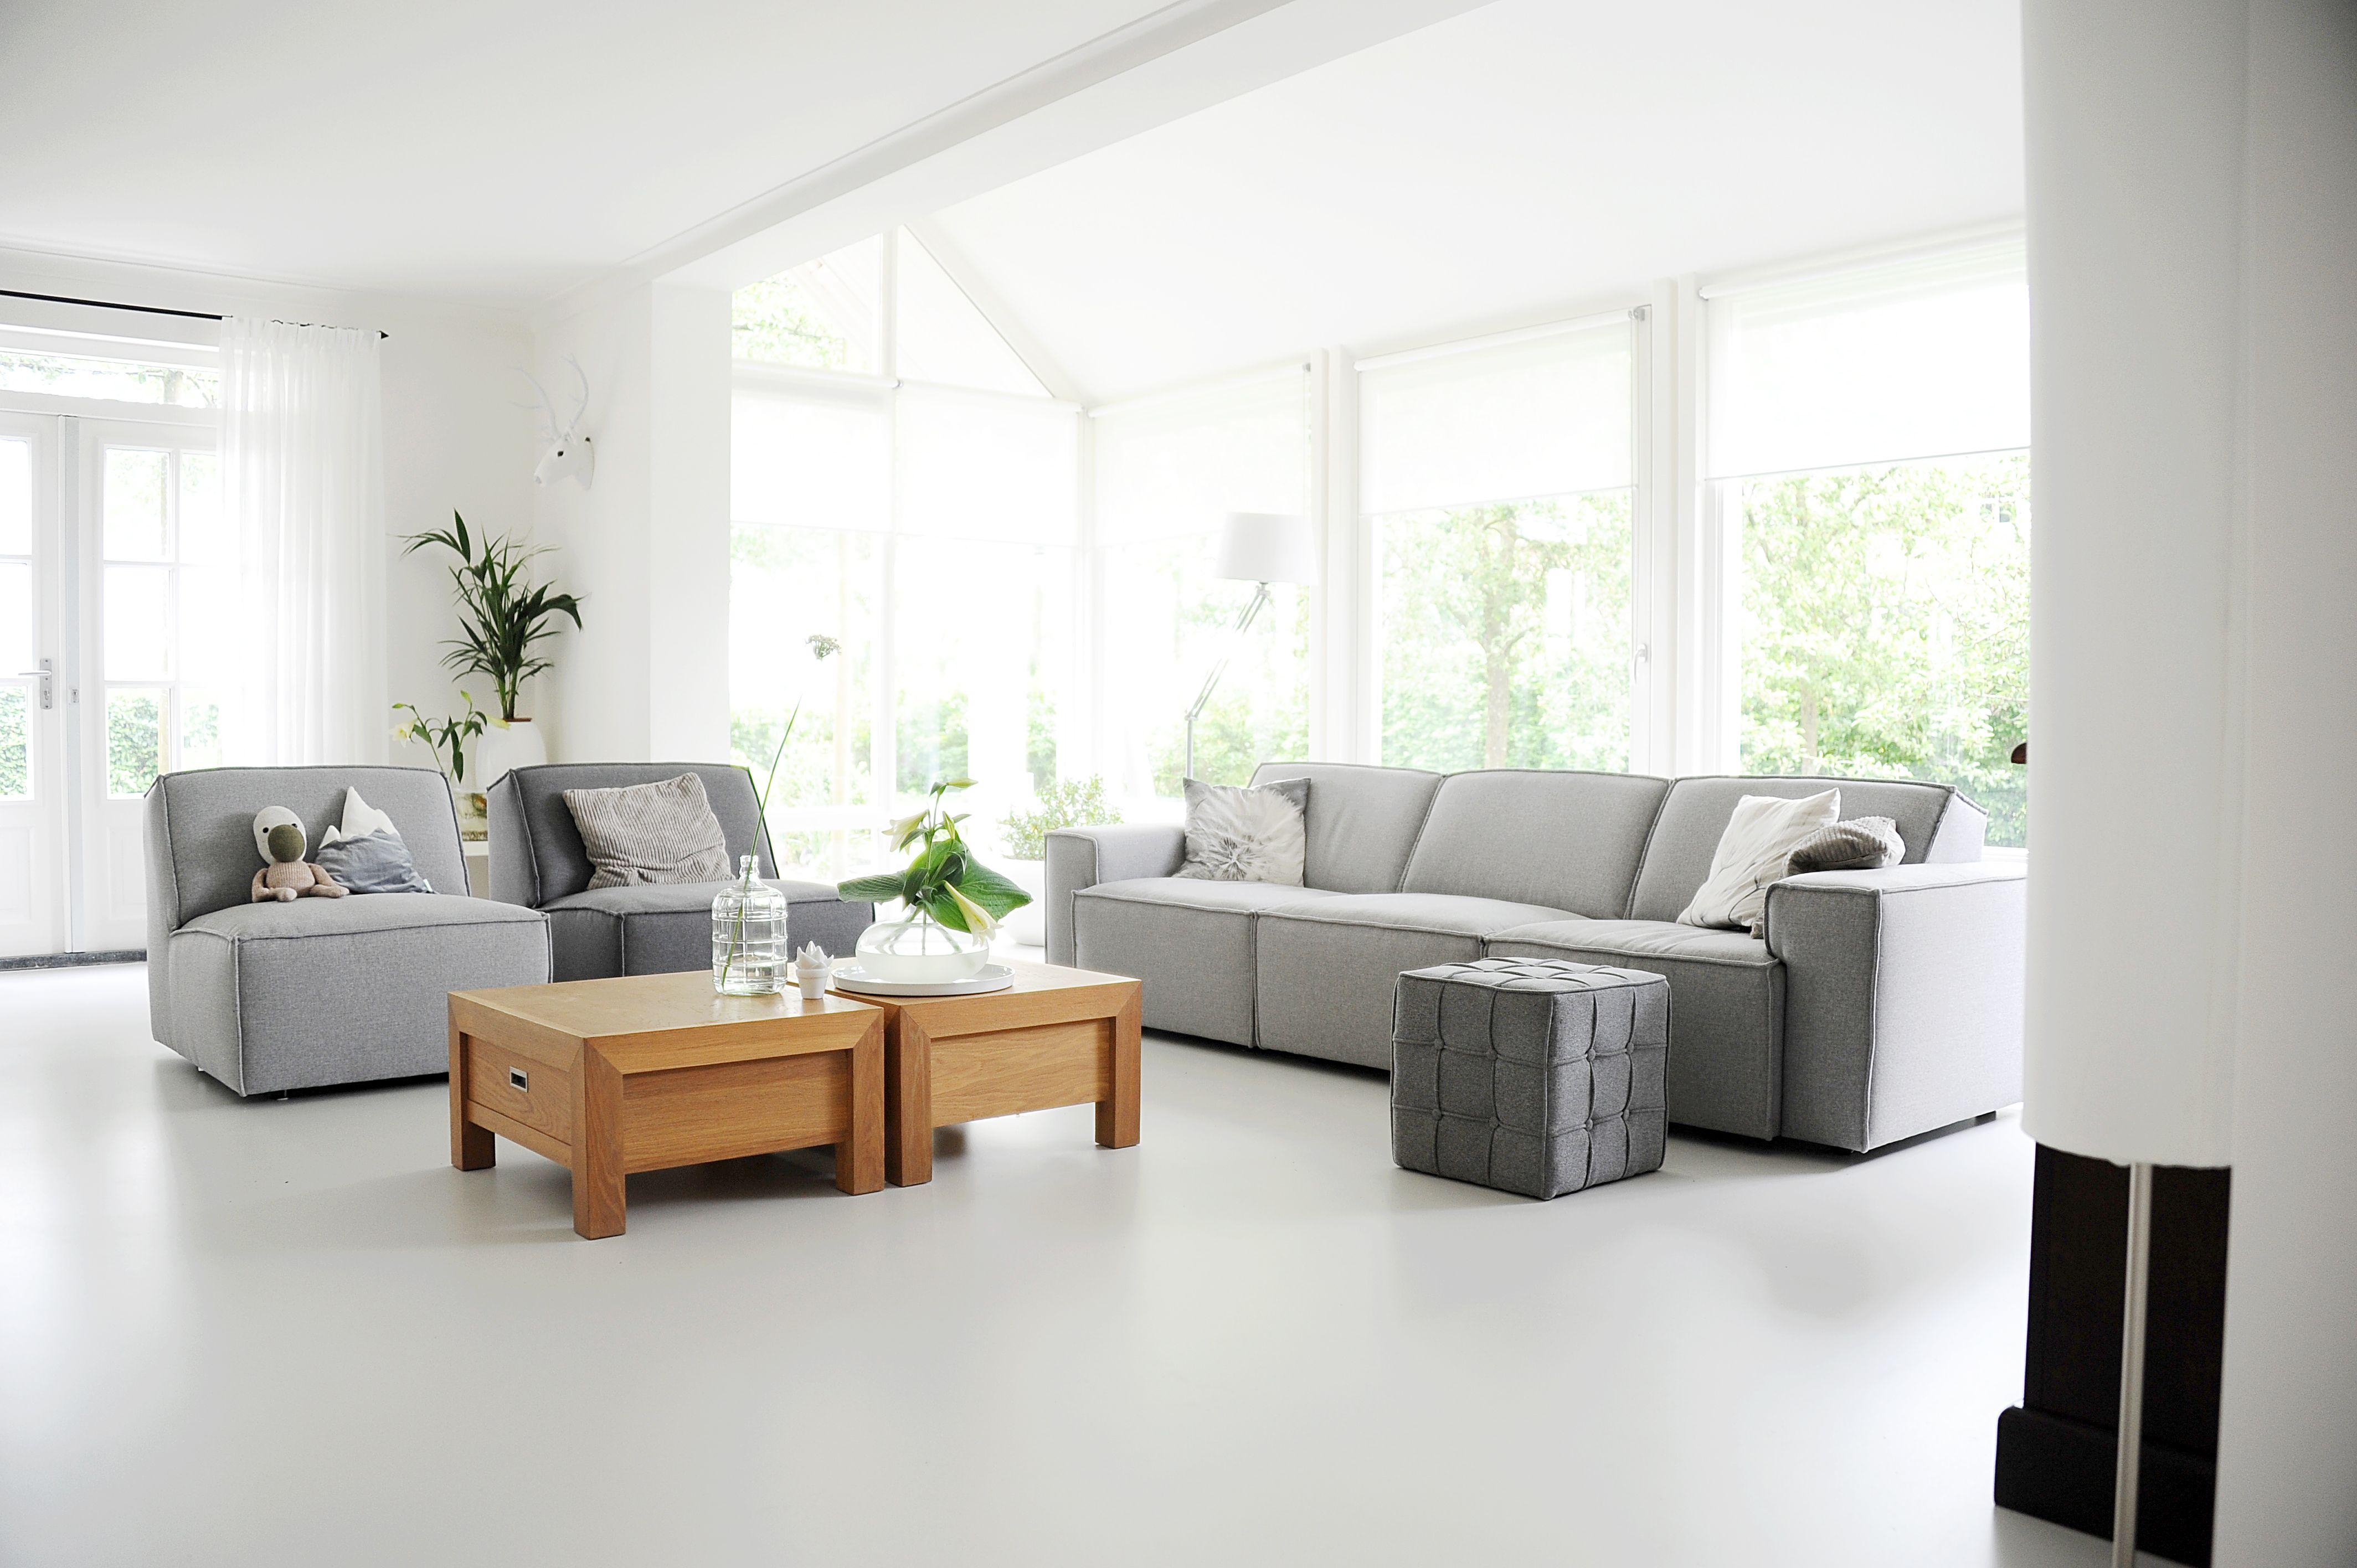 Woonkamer Lichte Kleuren : Woonkamer lichte kleuren modern nlfunvit modern interieur